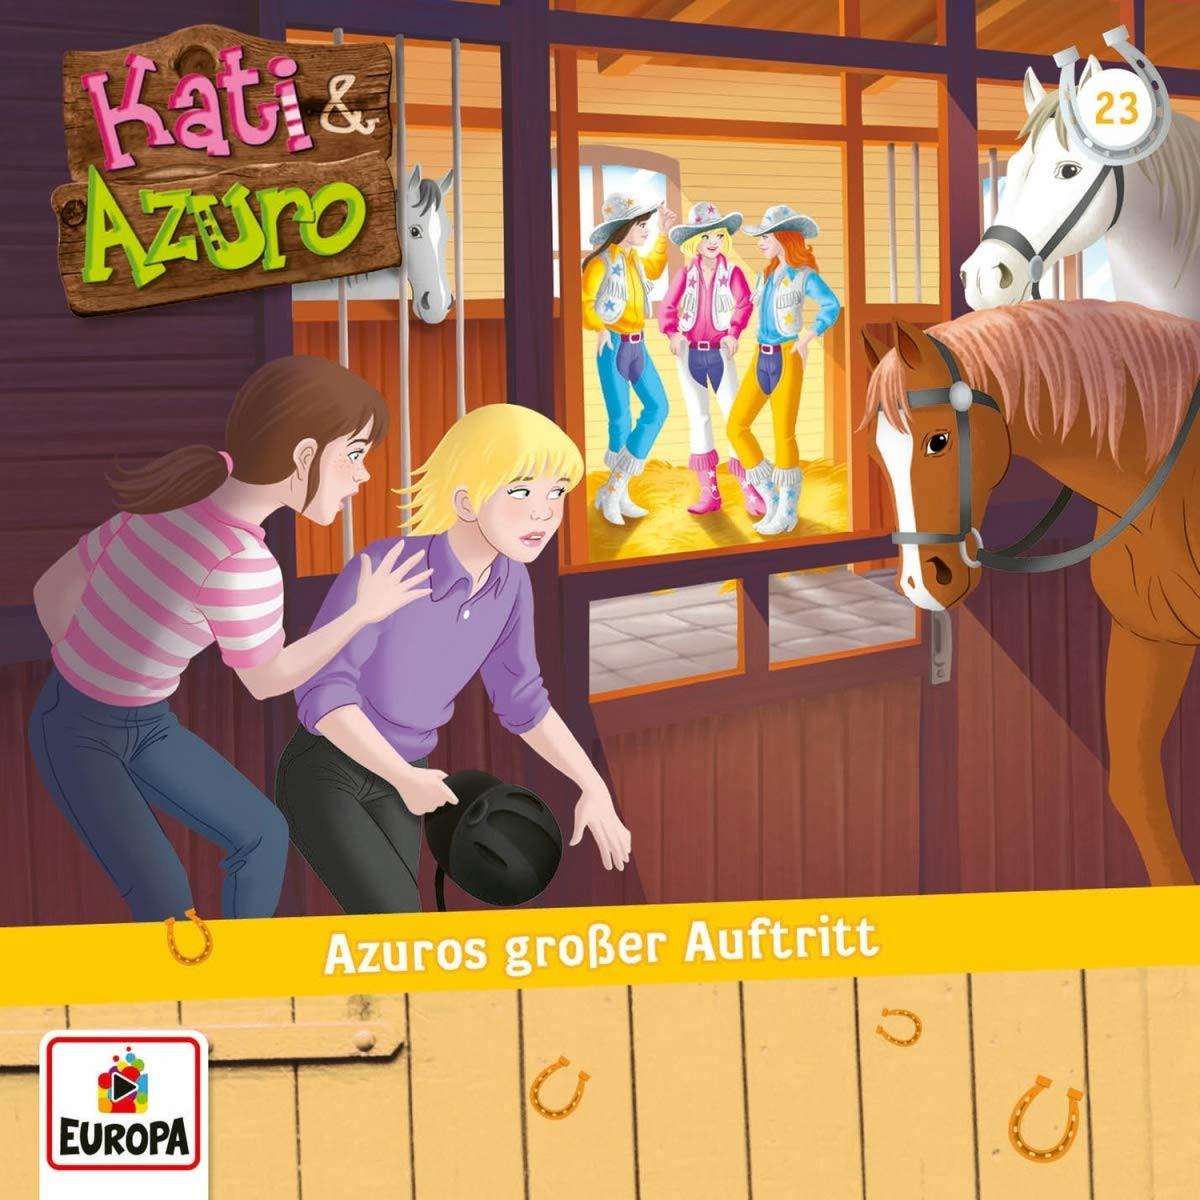 Kati & Azuro - Folge 23: Azuros großer Auftritt